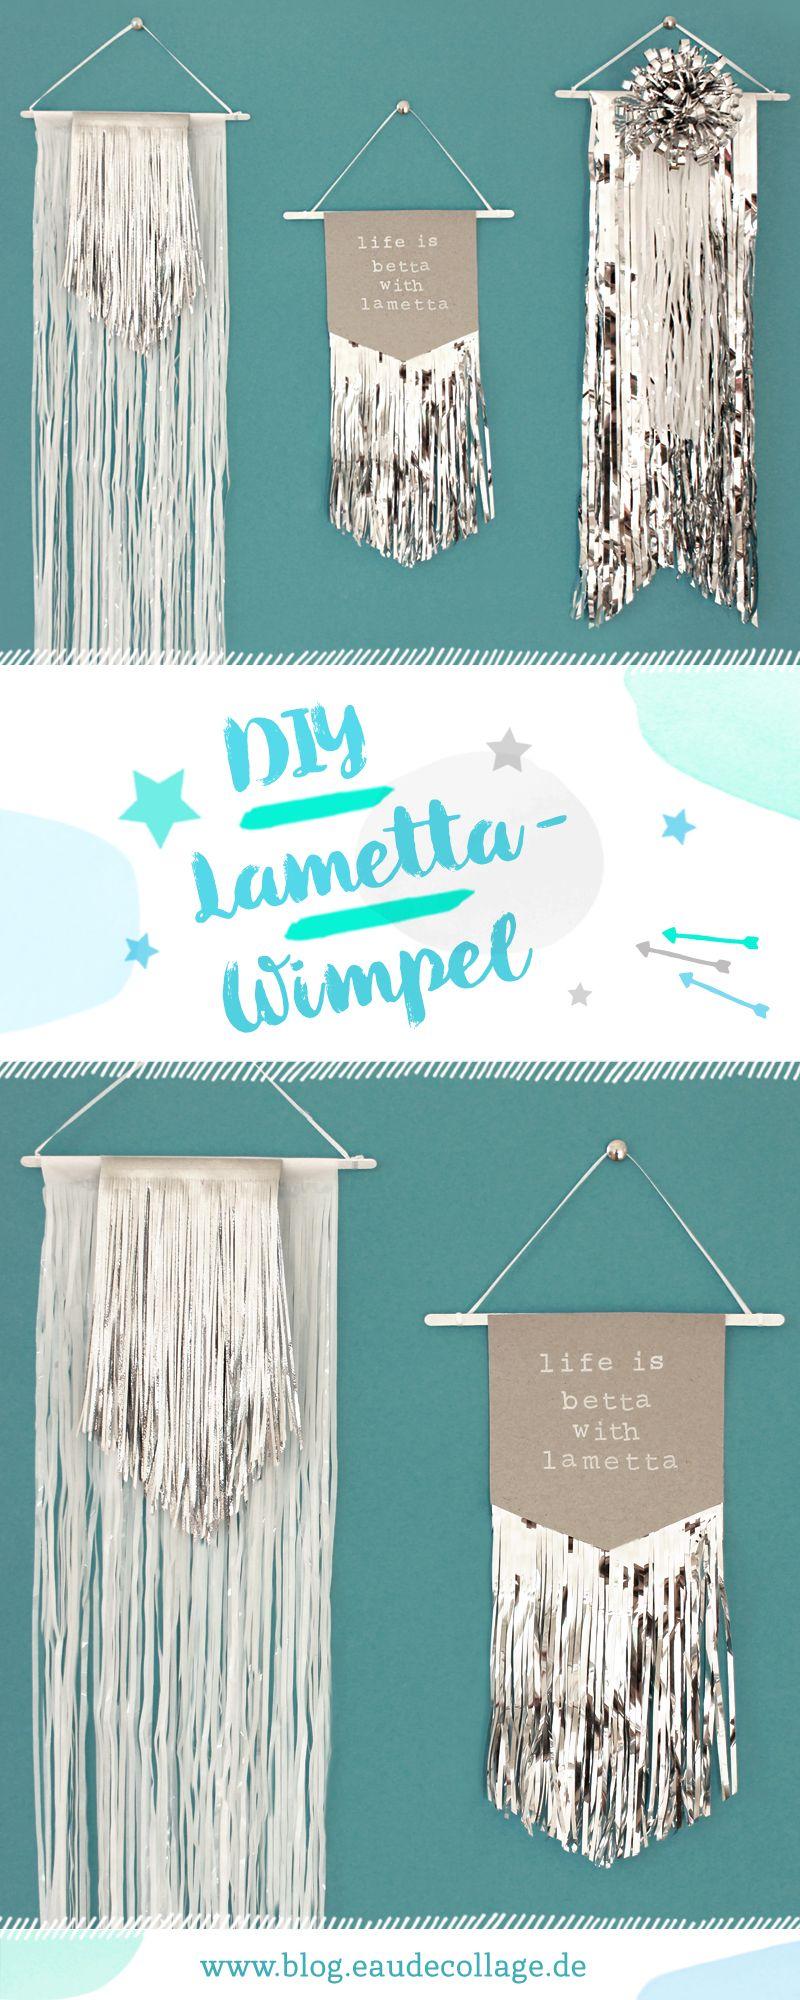 Weihnachtsdeko Lametta.Diy Lametta Wimpel Weihnachtsdeko Basteln Diy Blog Eau De